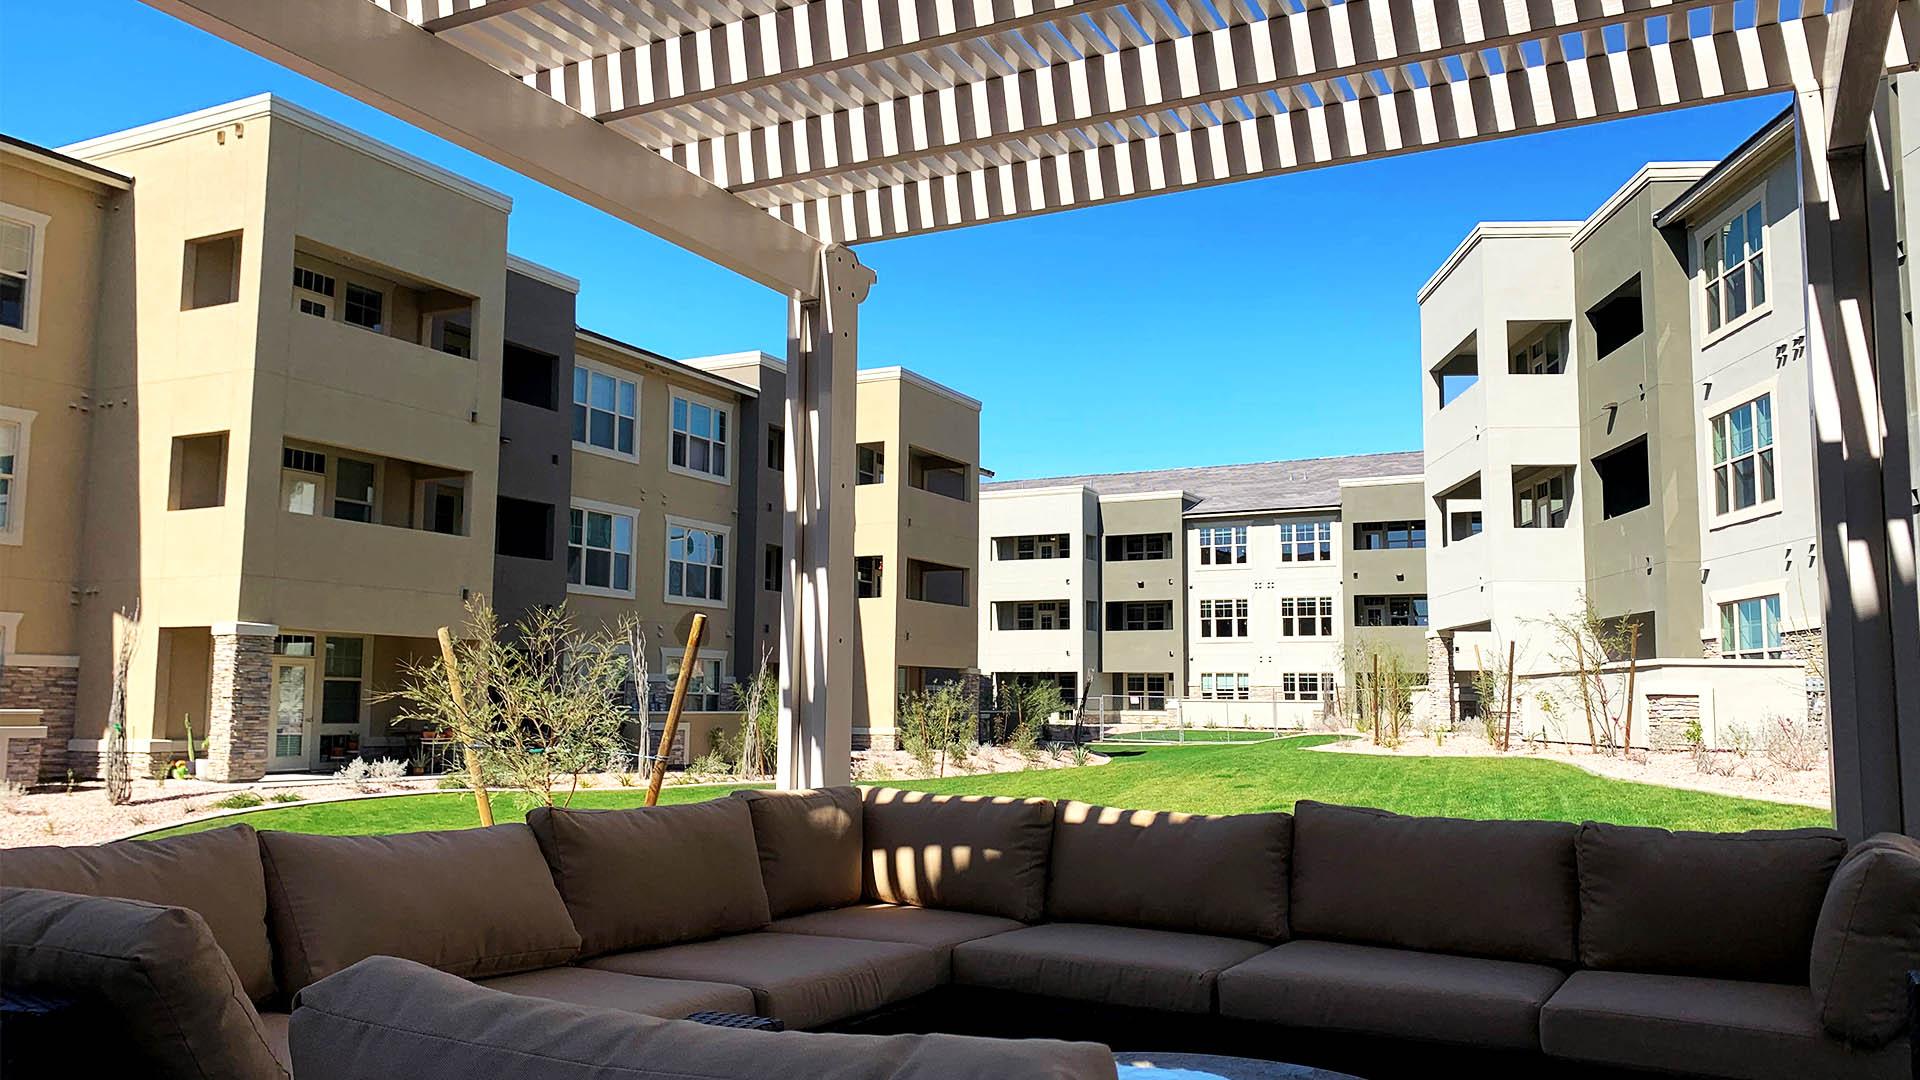 Luxury Apartments in Meza, AZ with outdoor lounge area